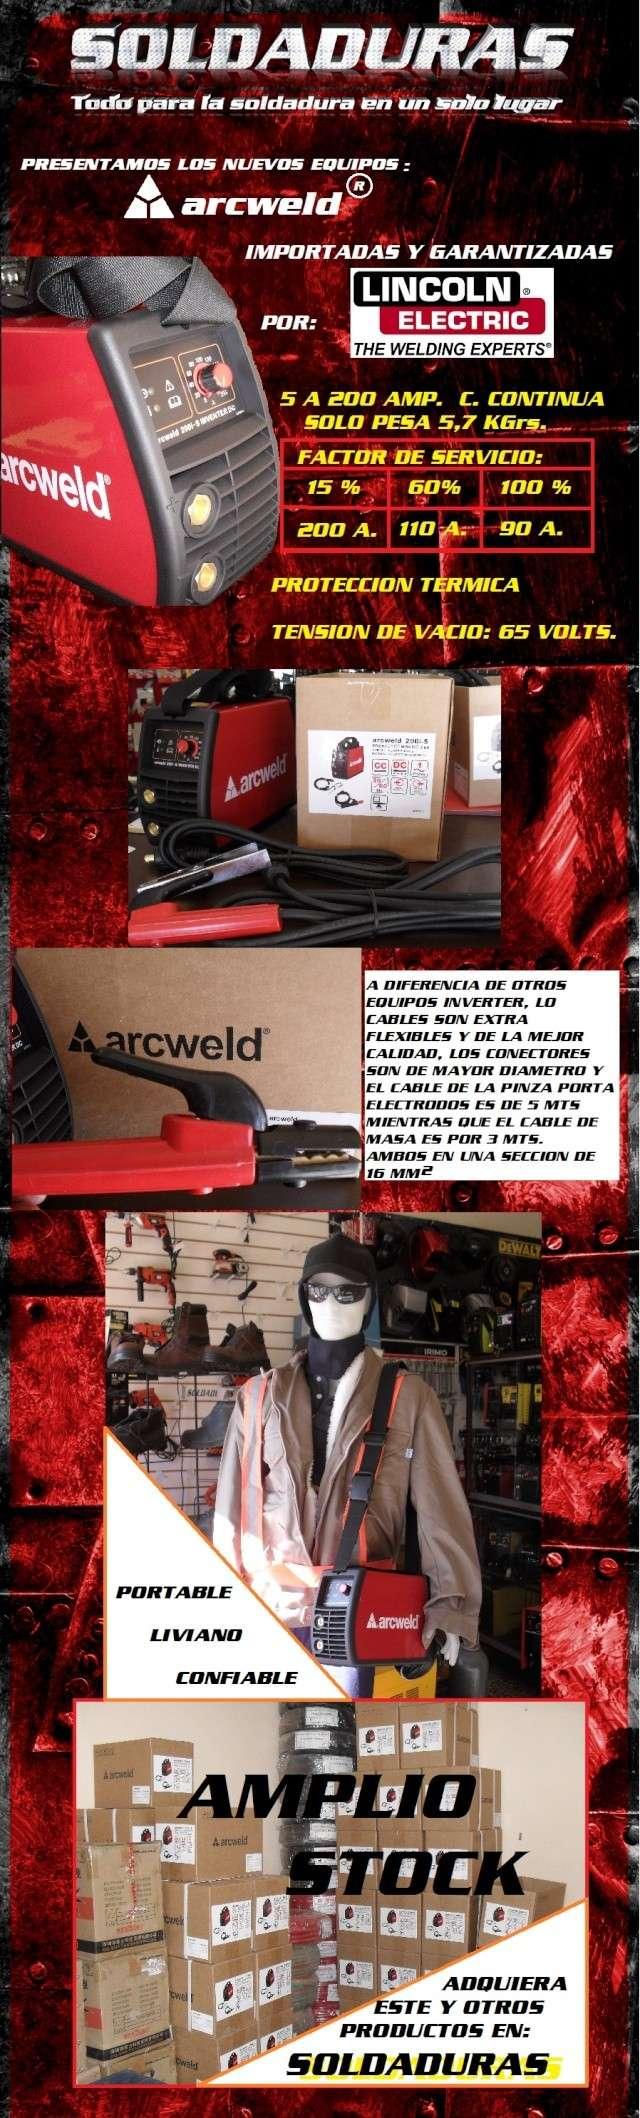 NUEVO EQUIPO DE SOLDADURA INVERTER ARCWELD 200 I-S Arcwel10